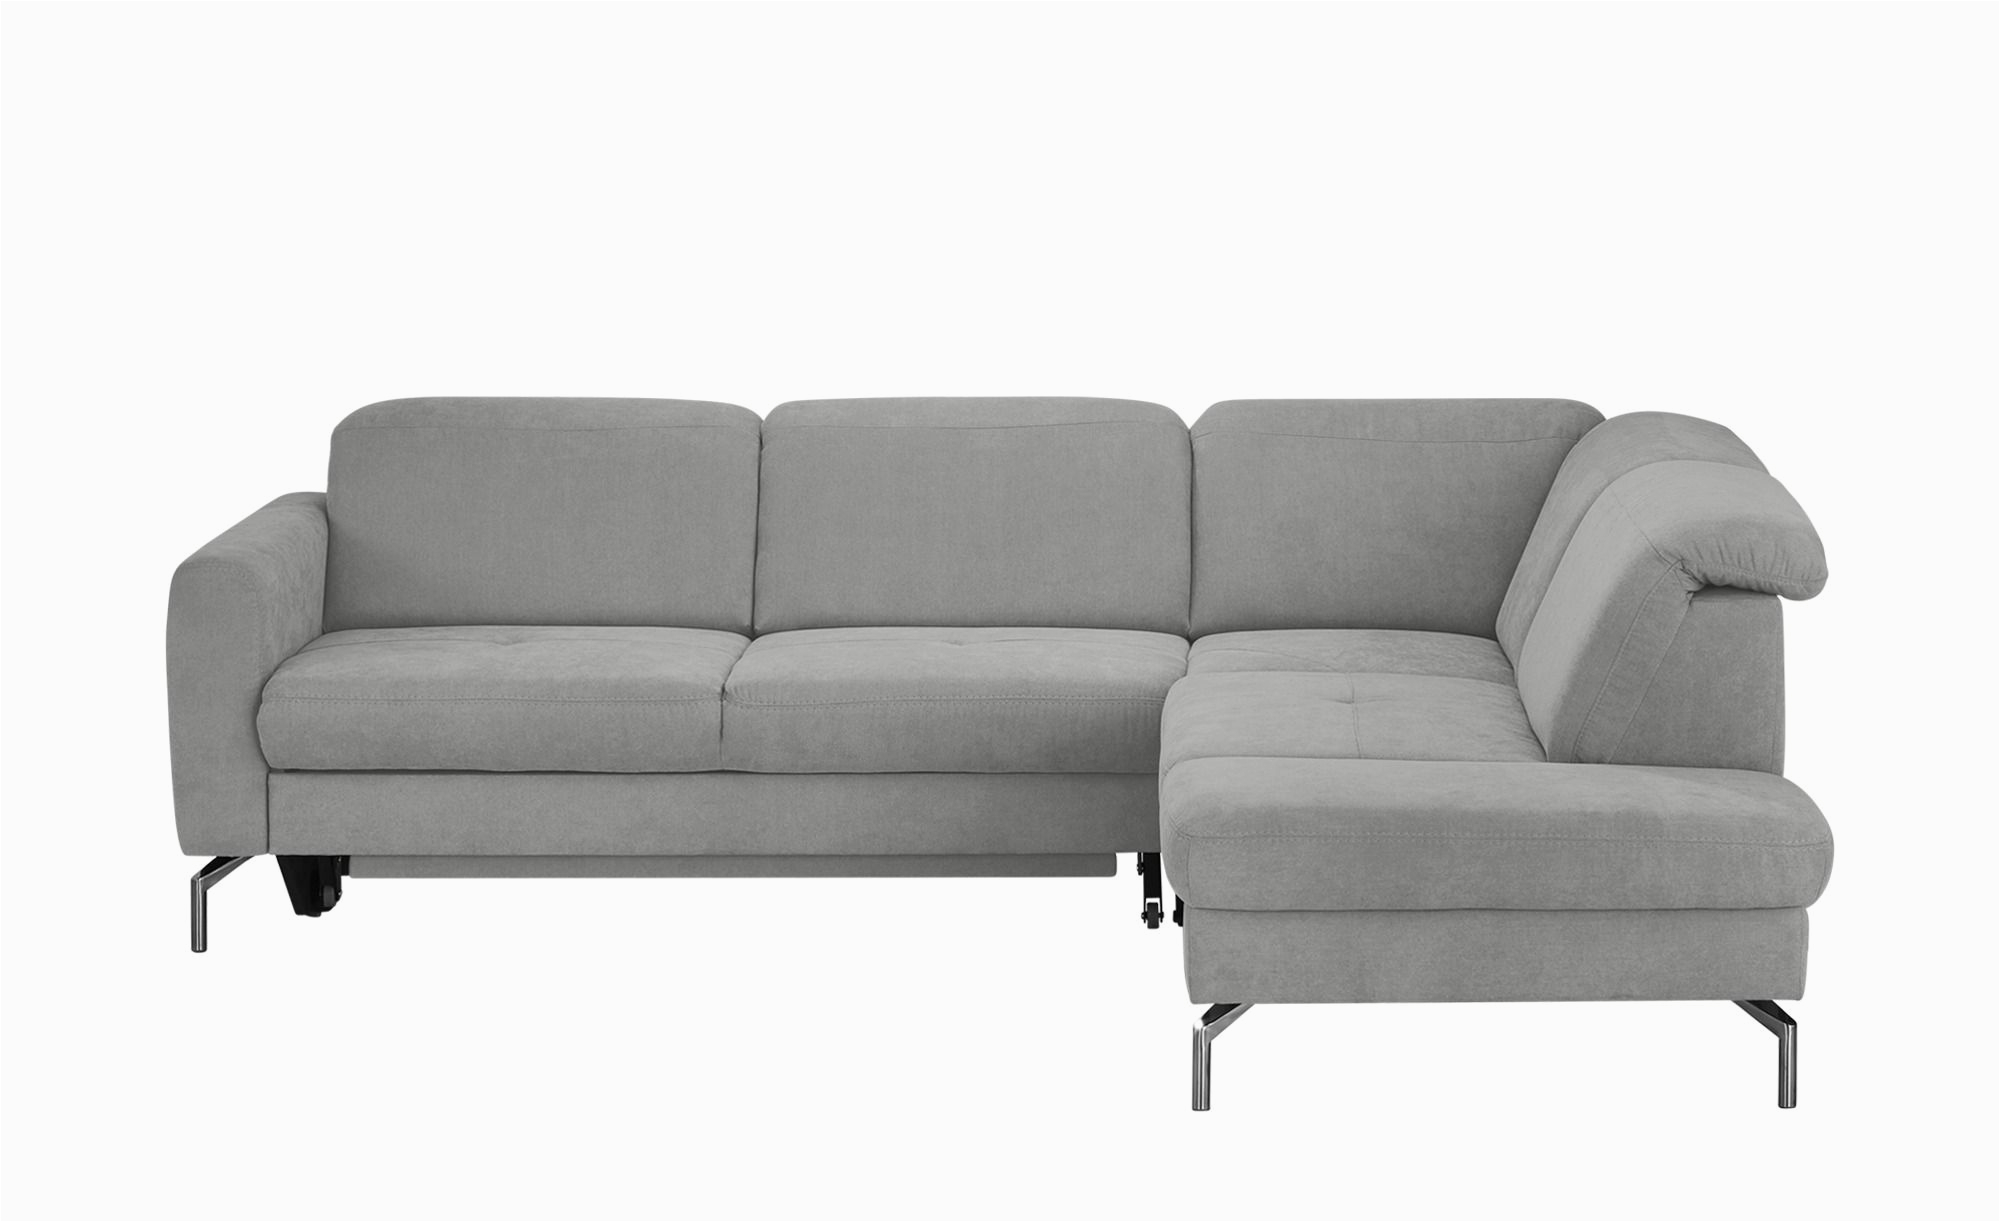 Sofaecke Grau Ikea Uno Ecksofa Grau Webstoff Lea